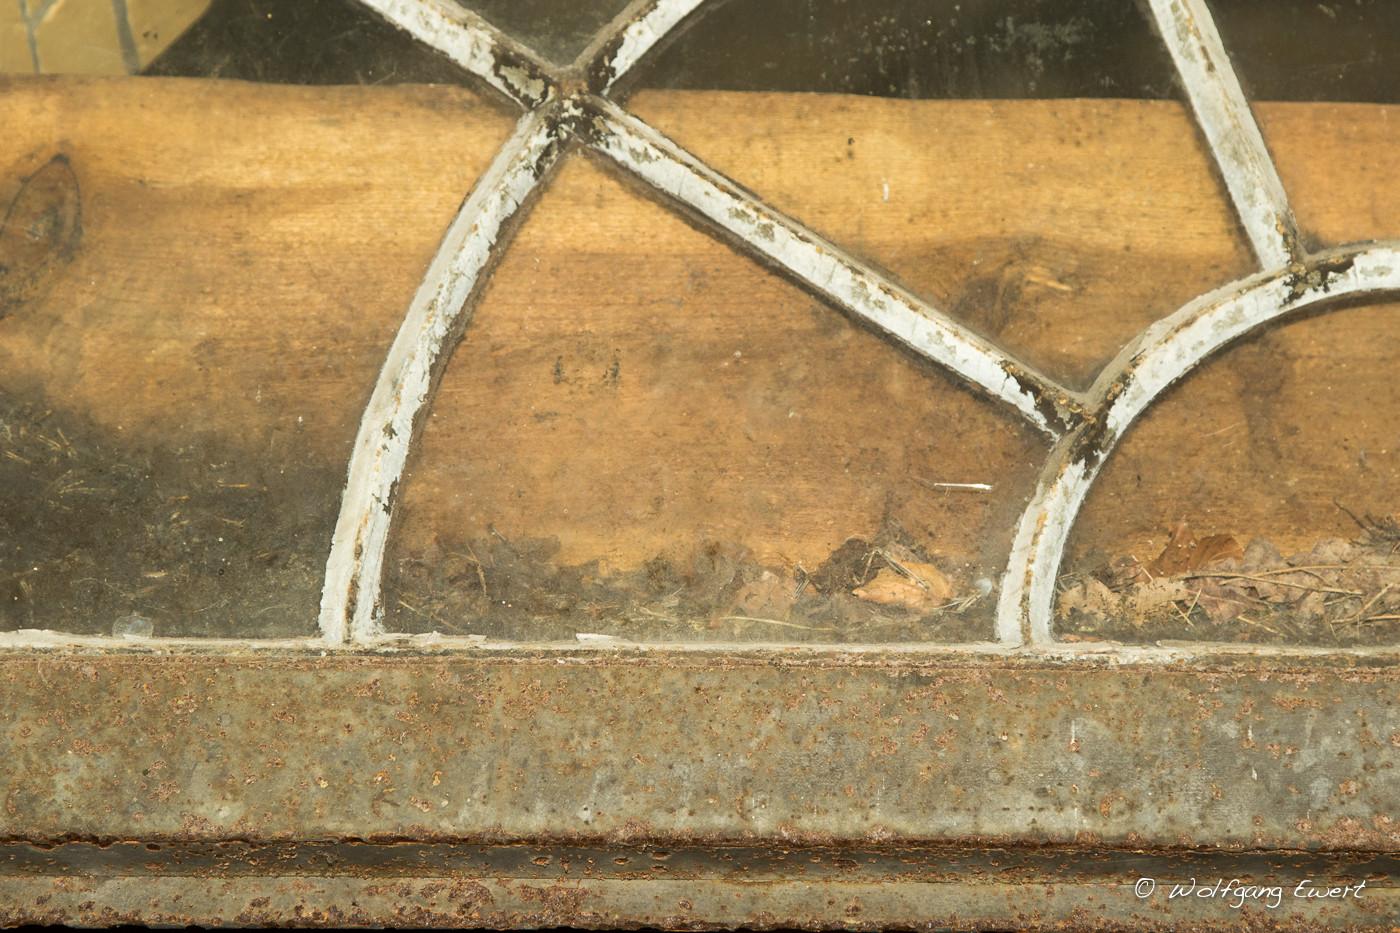 Jubiläumsfontaine - Fledermausskelett-Teile hinter Glas- Foto: Wolfgang Ewert